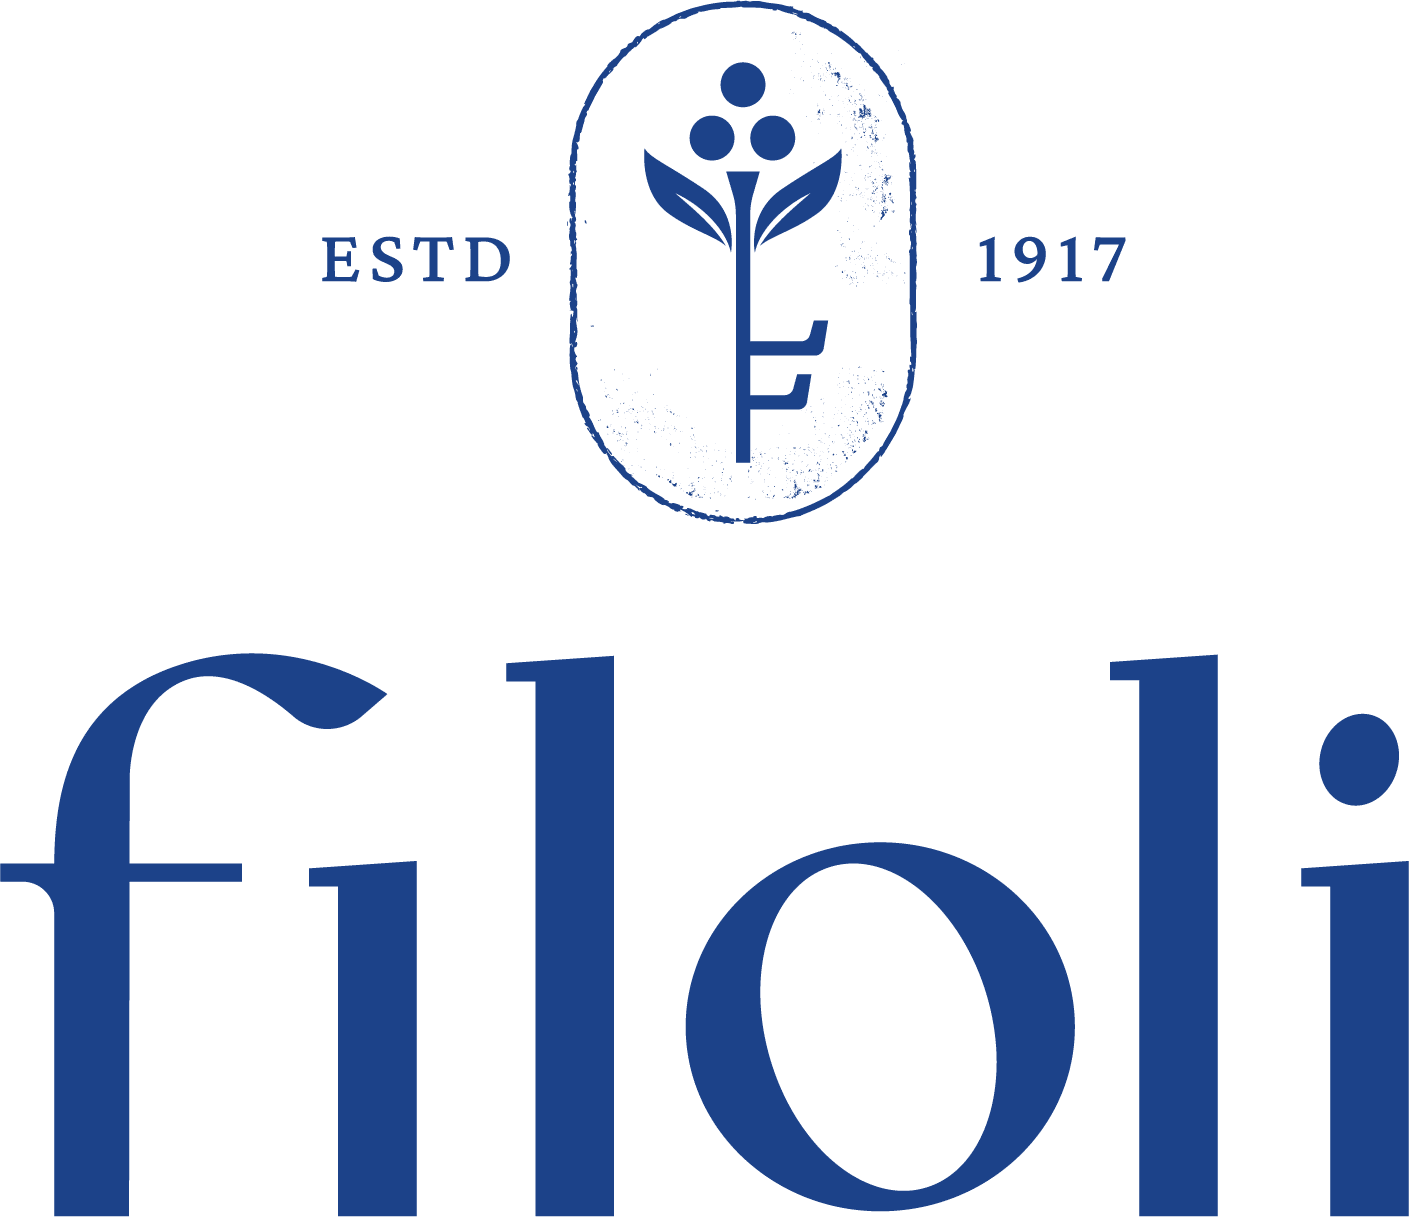 Filoli Logo Color FullLockup